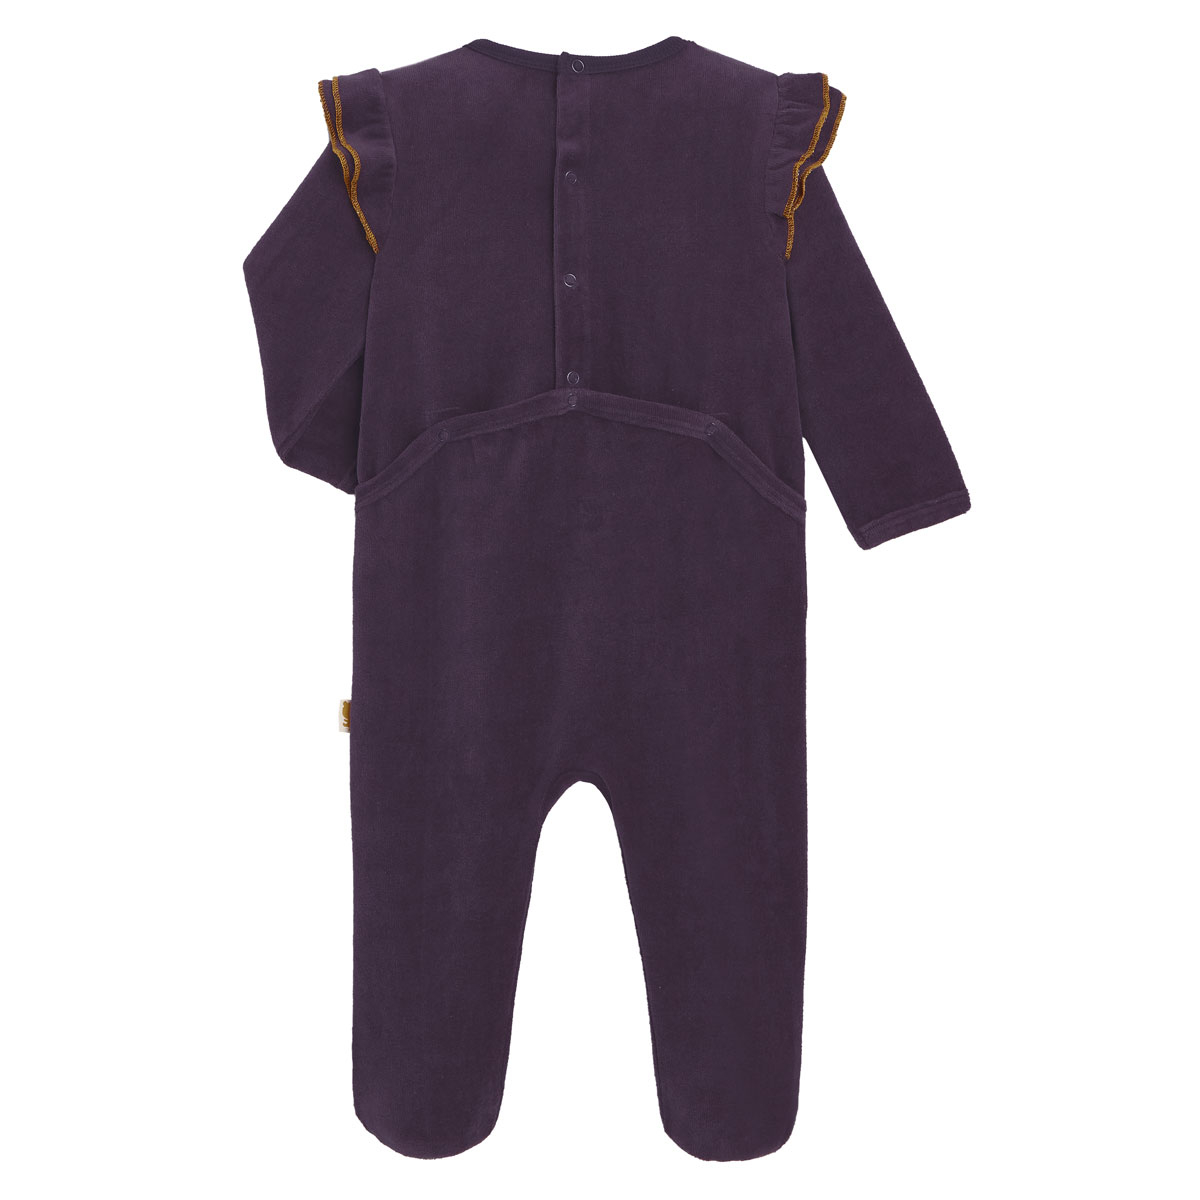 Pyjama bébé en velours contenant du coton bio Funky Safari dos